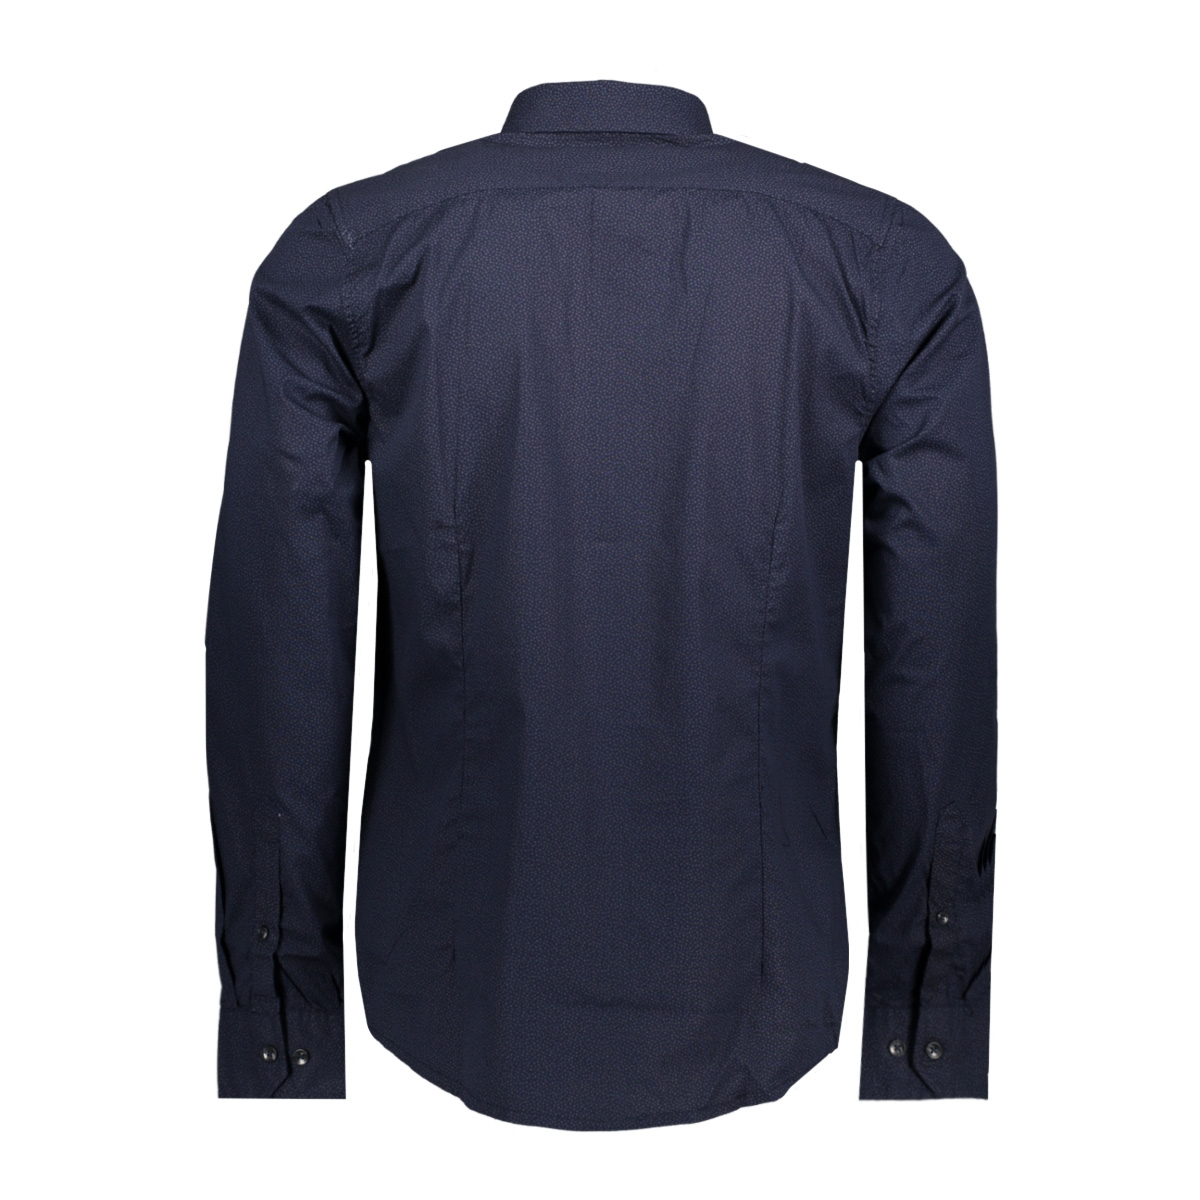 l71227 garcia overhemd 2346